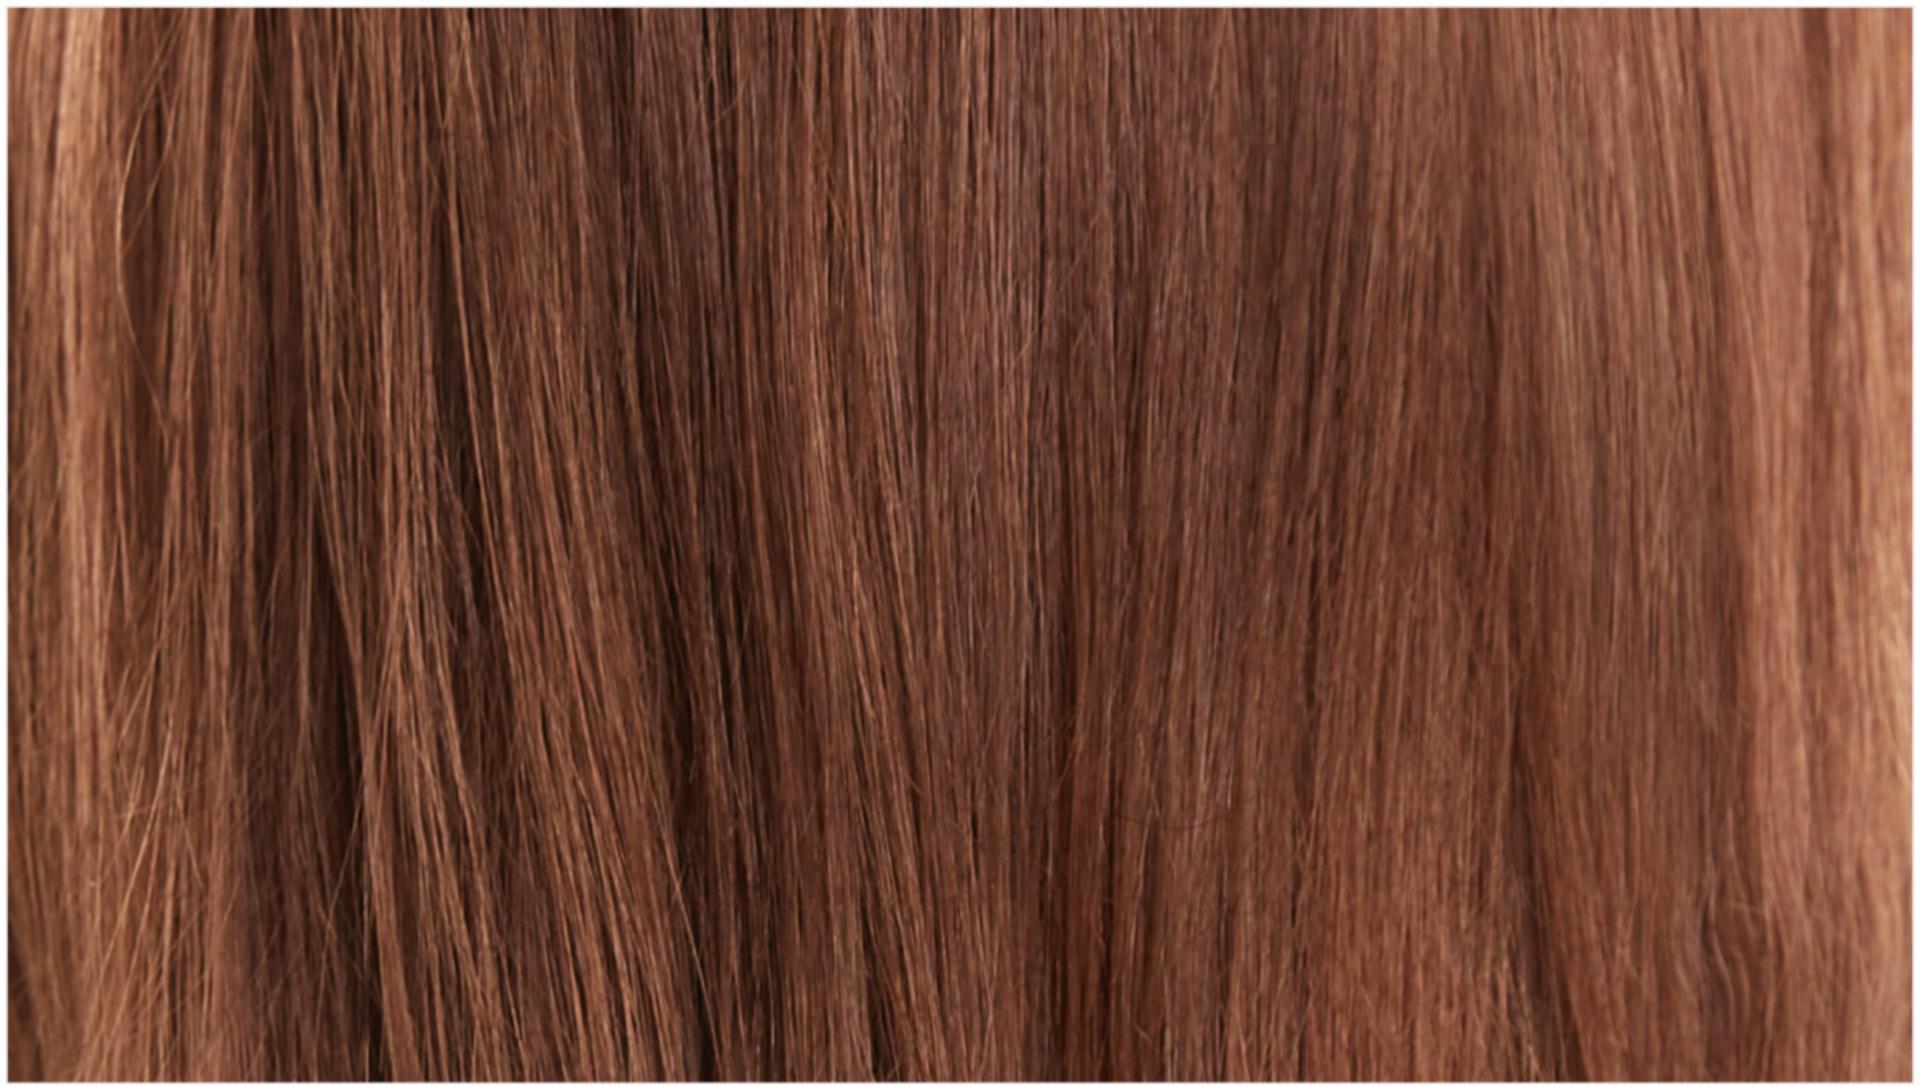 Hair colour can fade